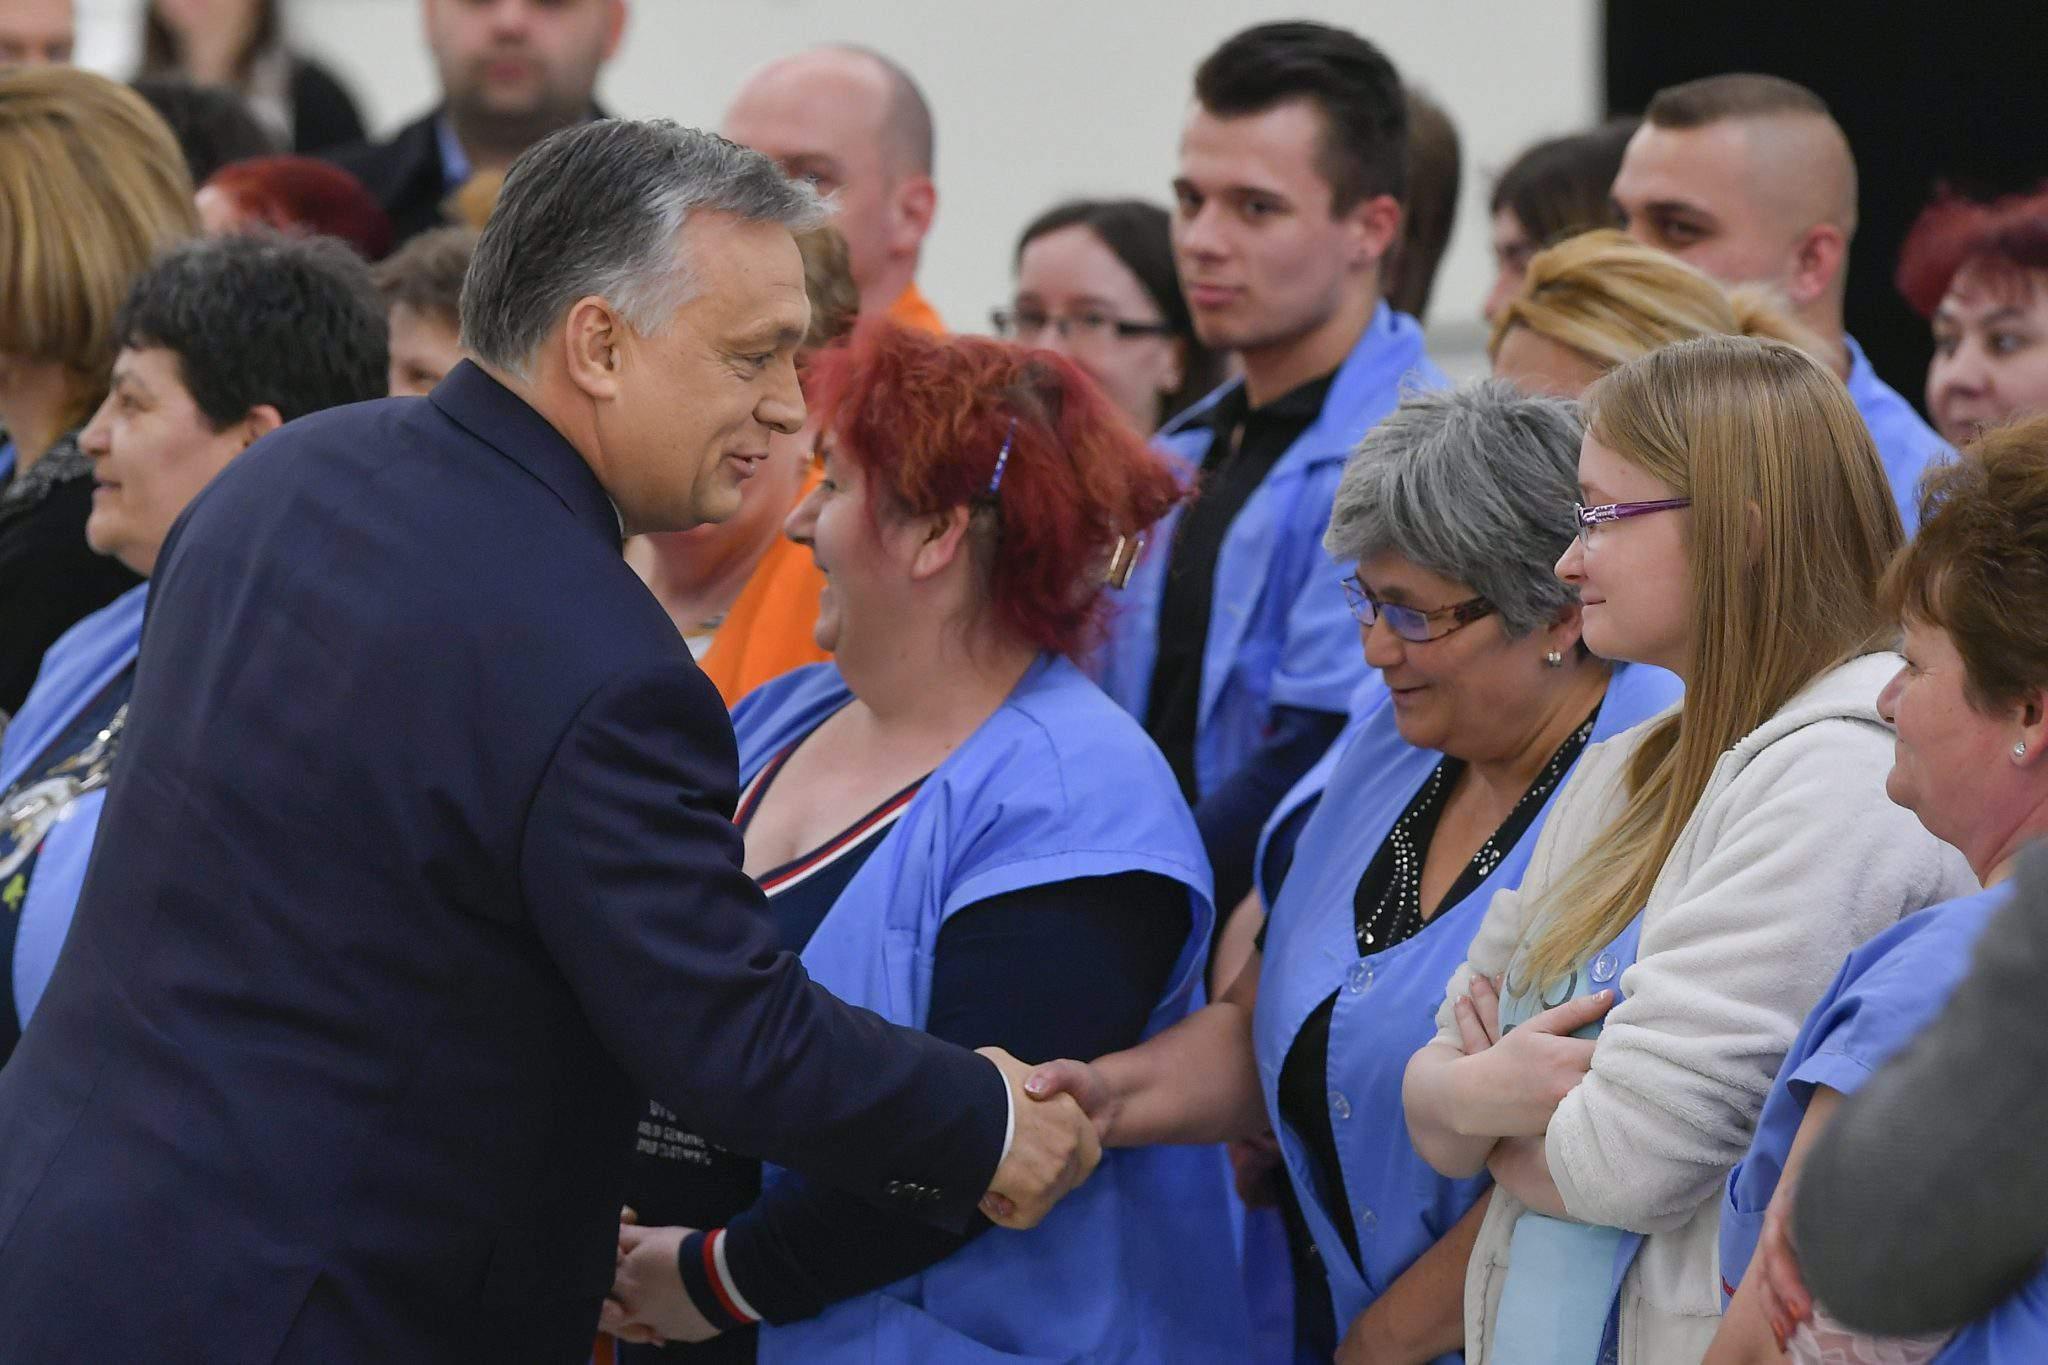 Viktor Orbán election2018 campaign